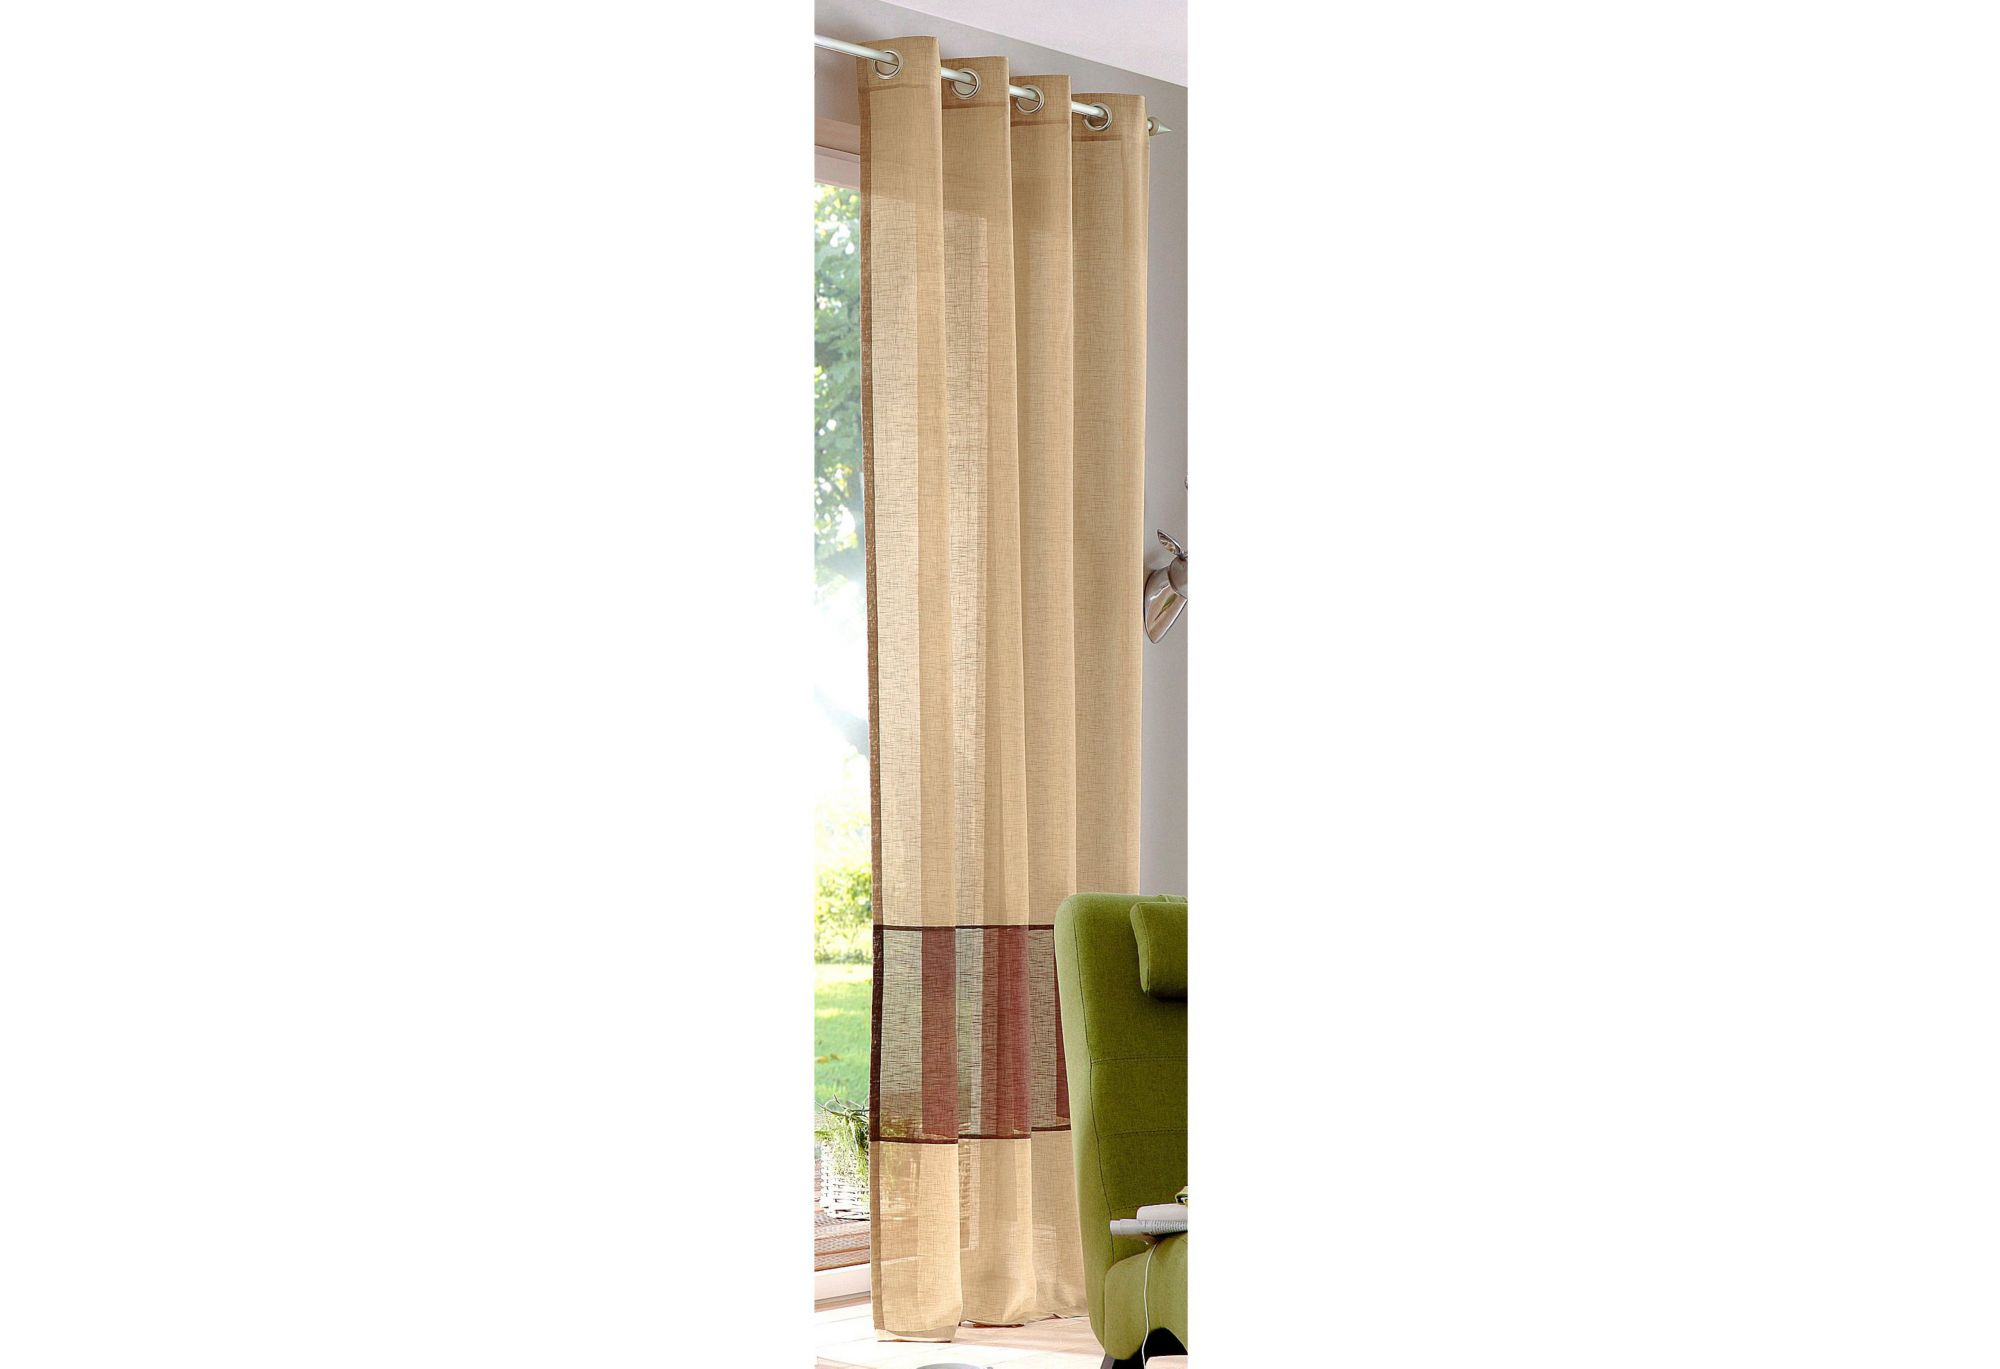 gardine my home lansing 1 st ck schwab versand transparente gardinen. Black Bedroom Furniture Sets. Home Design Ideas